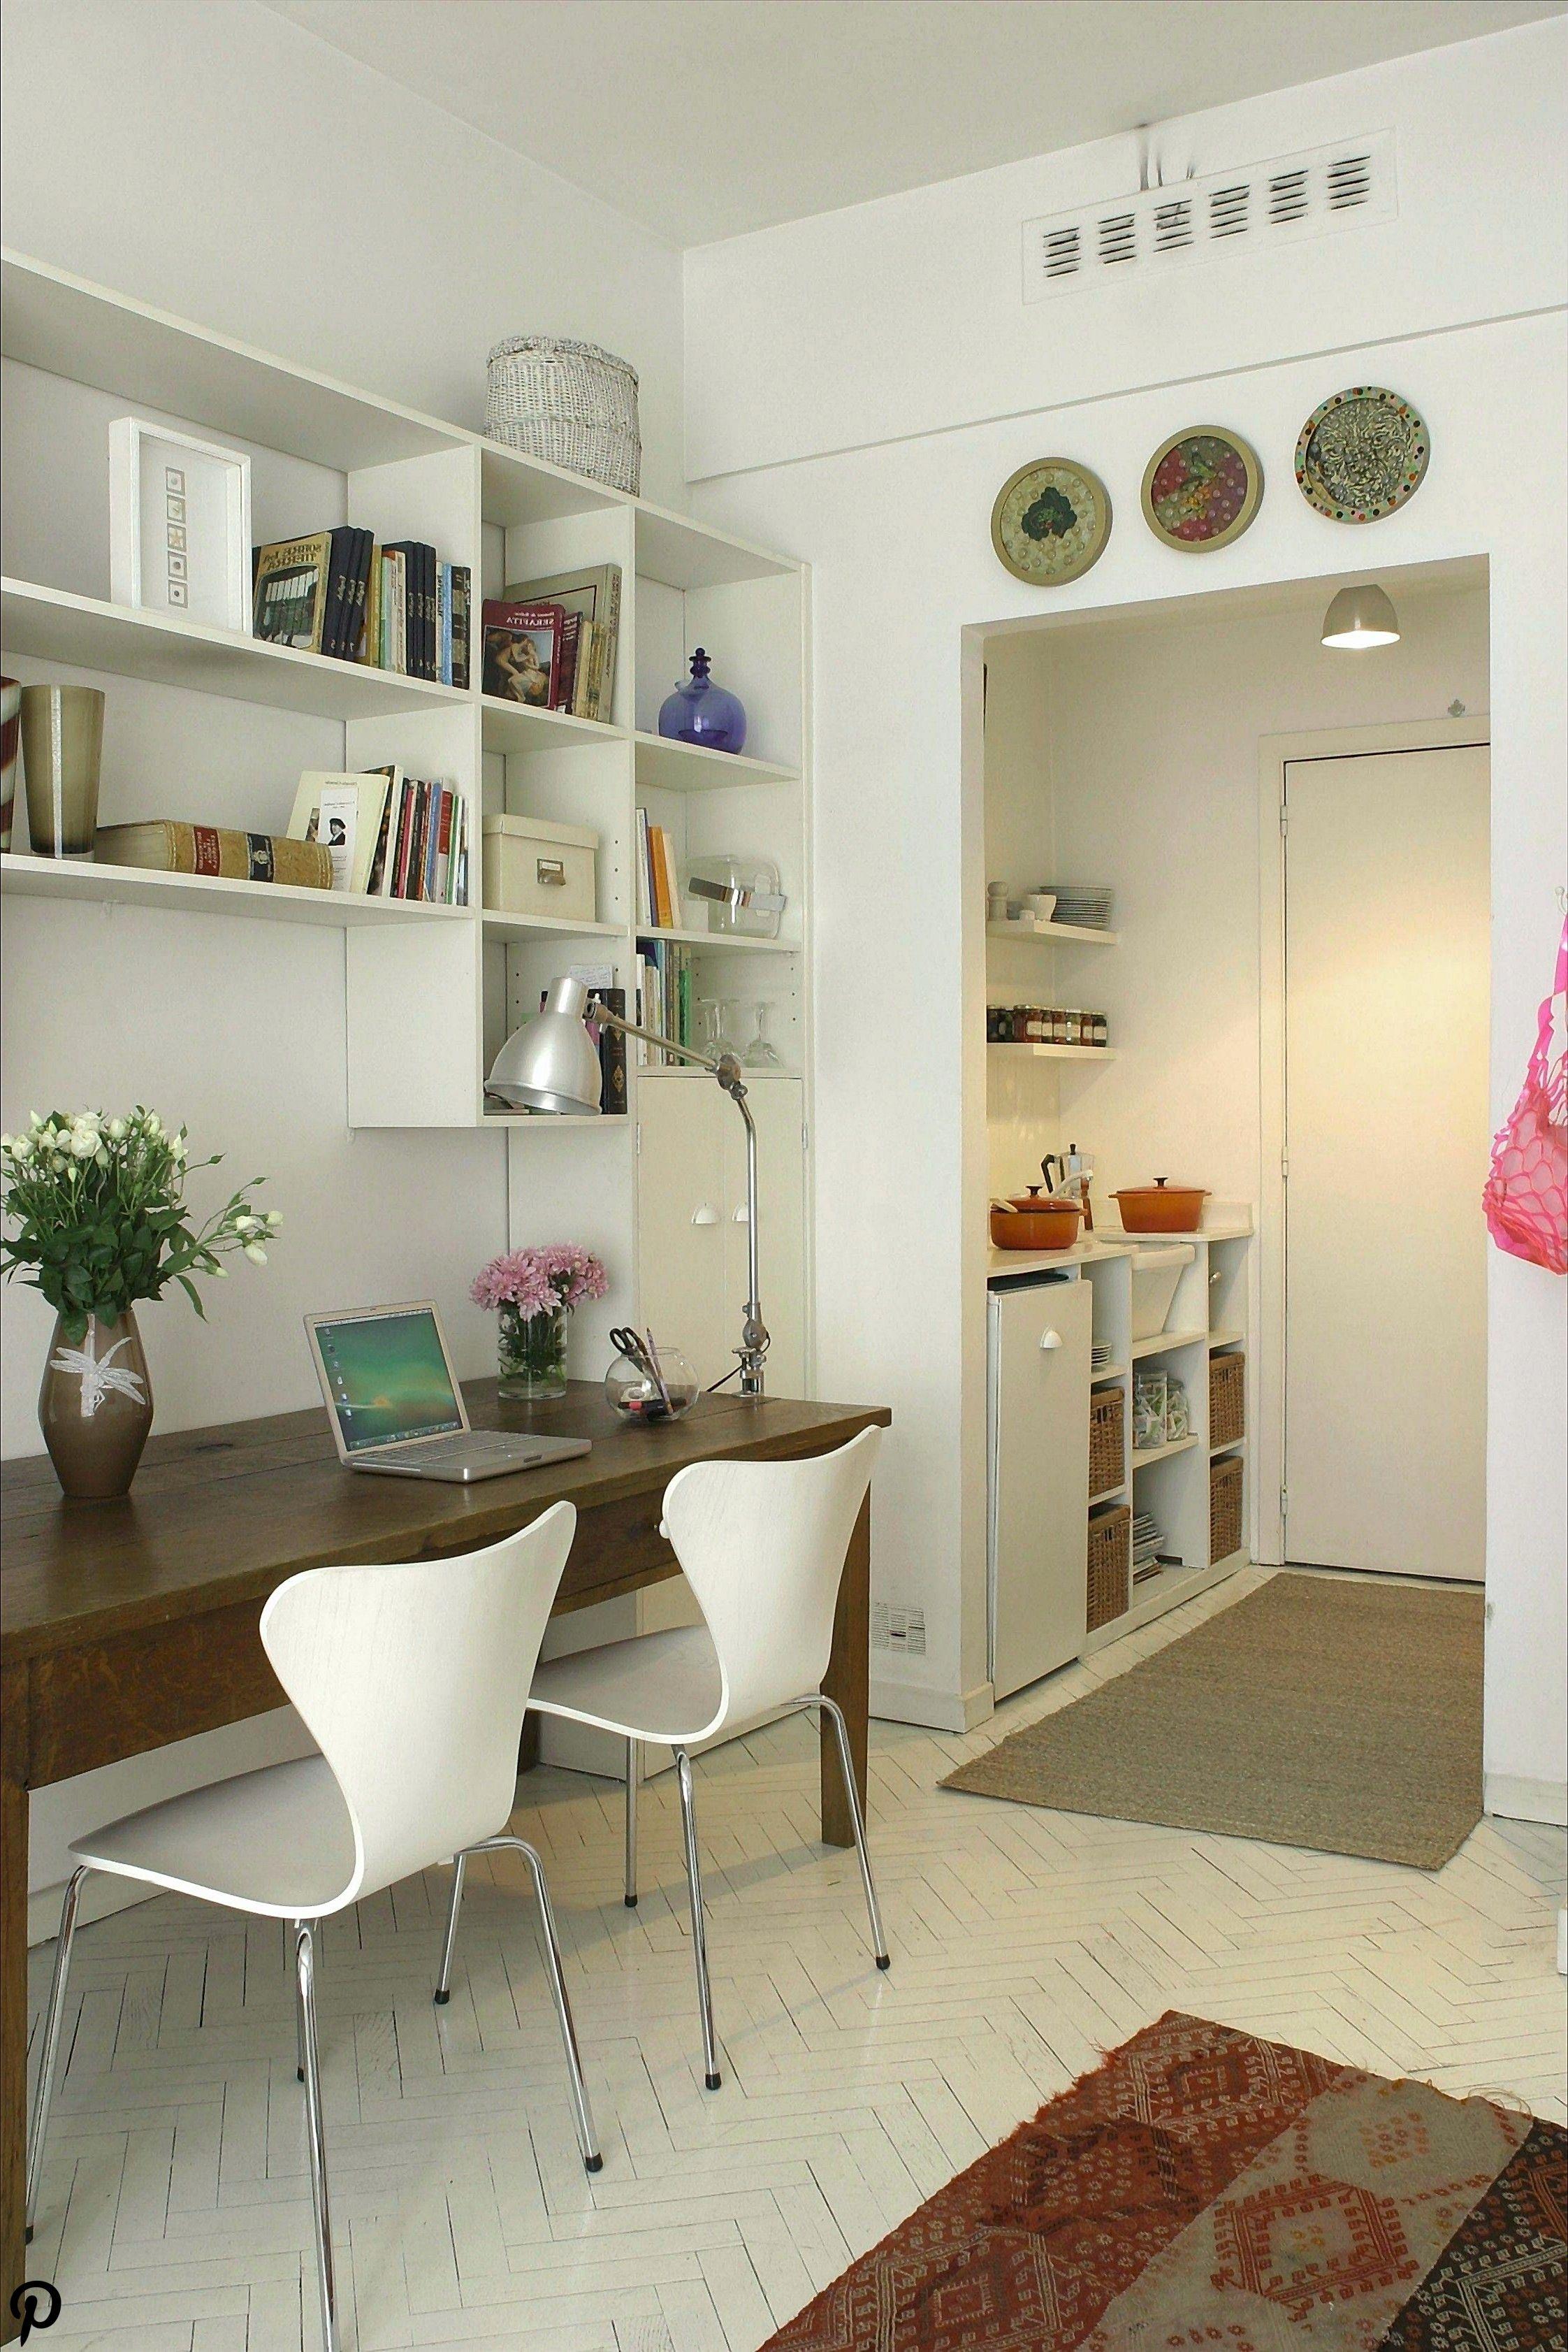 Wohnzimmer Ideen Pinterest Neu Gartendeko Wohnzimmerideen Wohnzimmerideenwandgestaltung Gartenid Wohnung Einrichten Wohnzimmer Ideen Wohnung Kuche